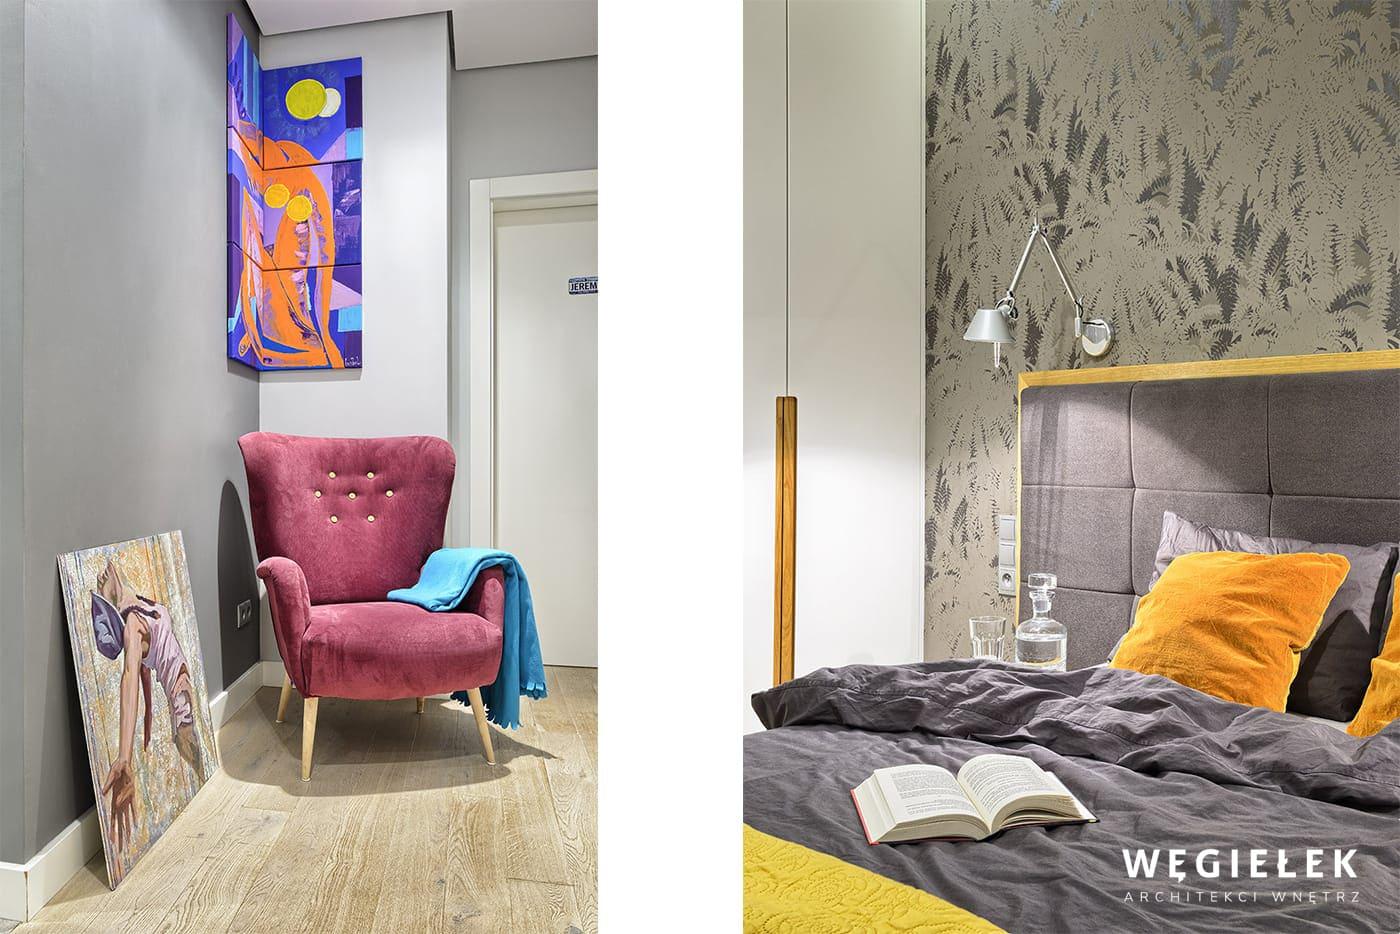 08 apartament meble tapicerowane